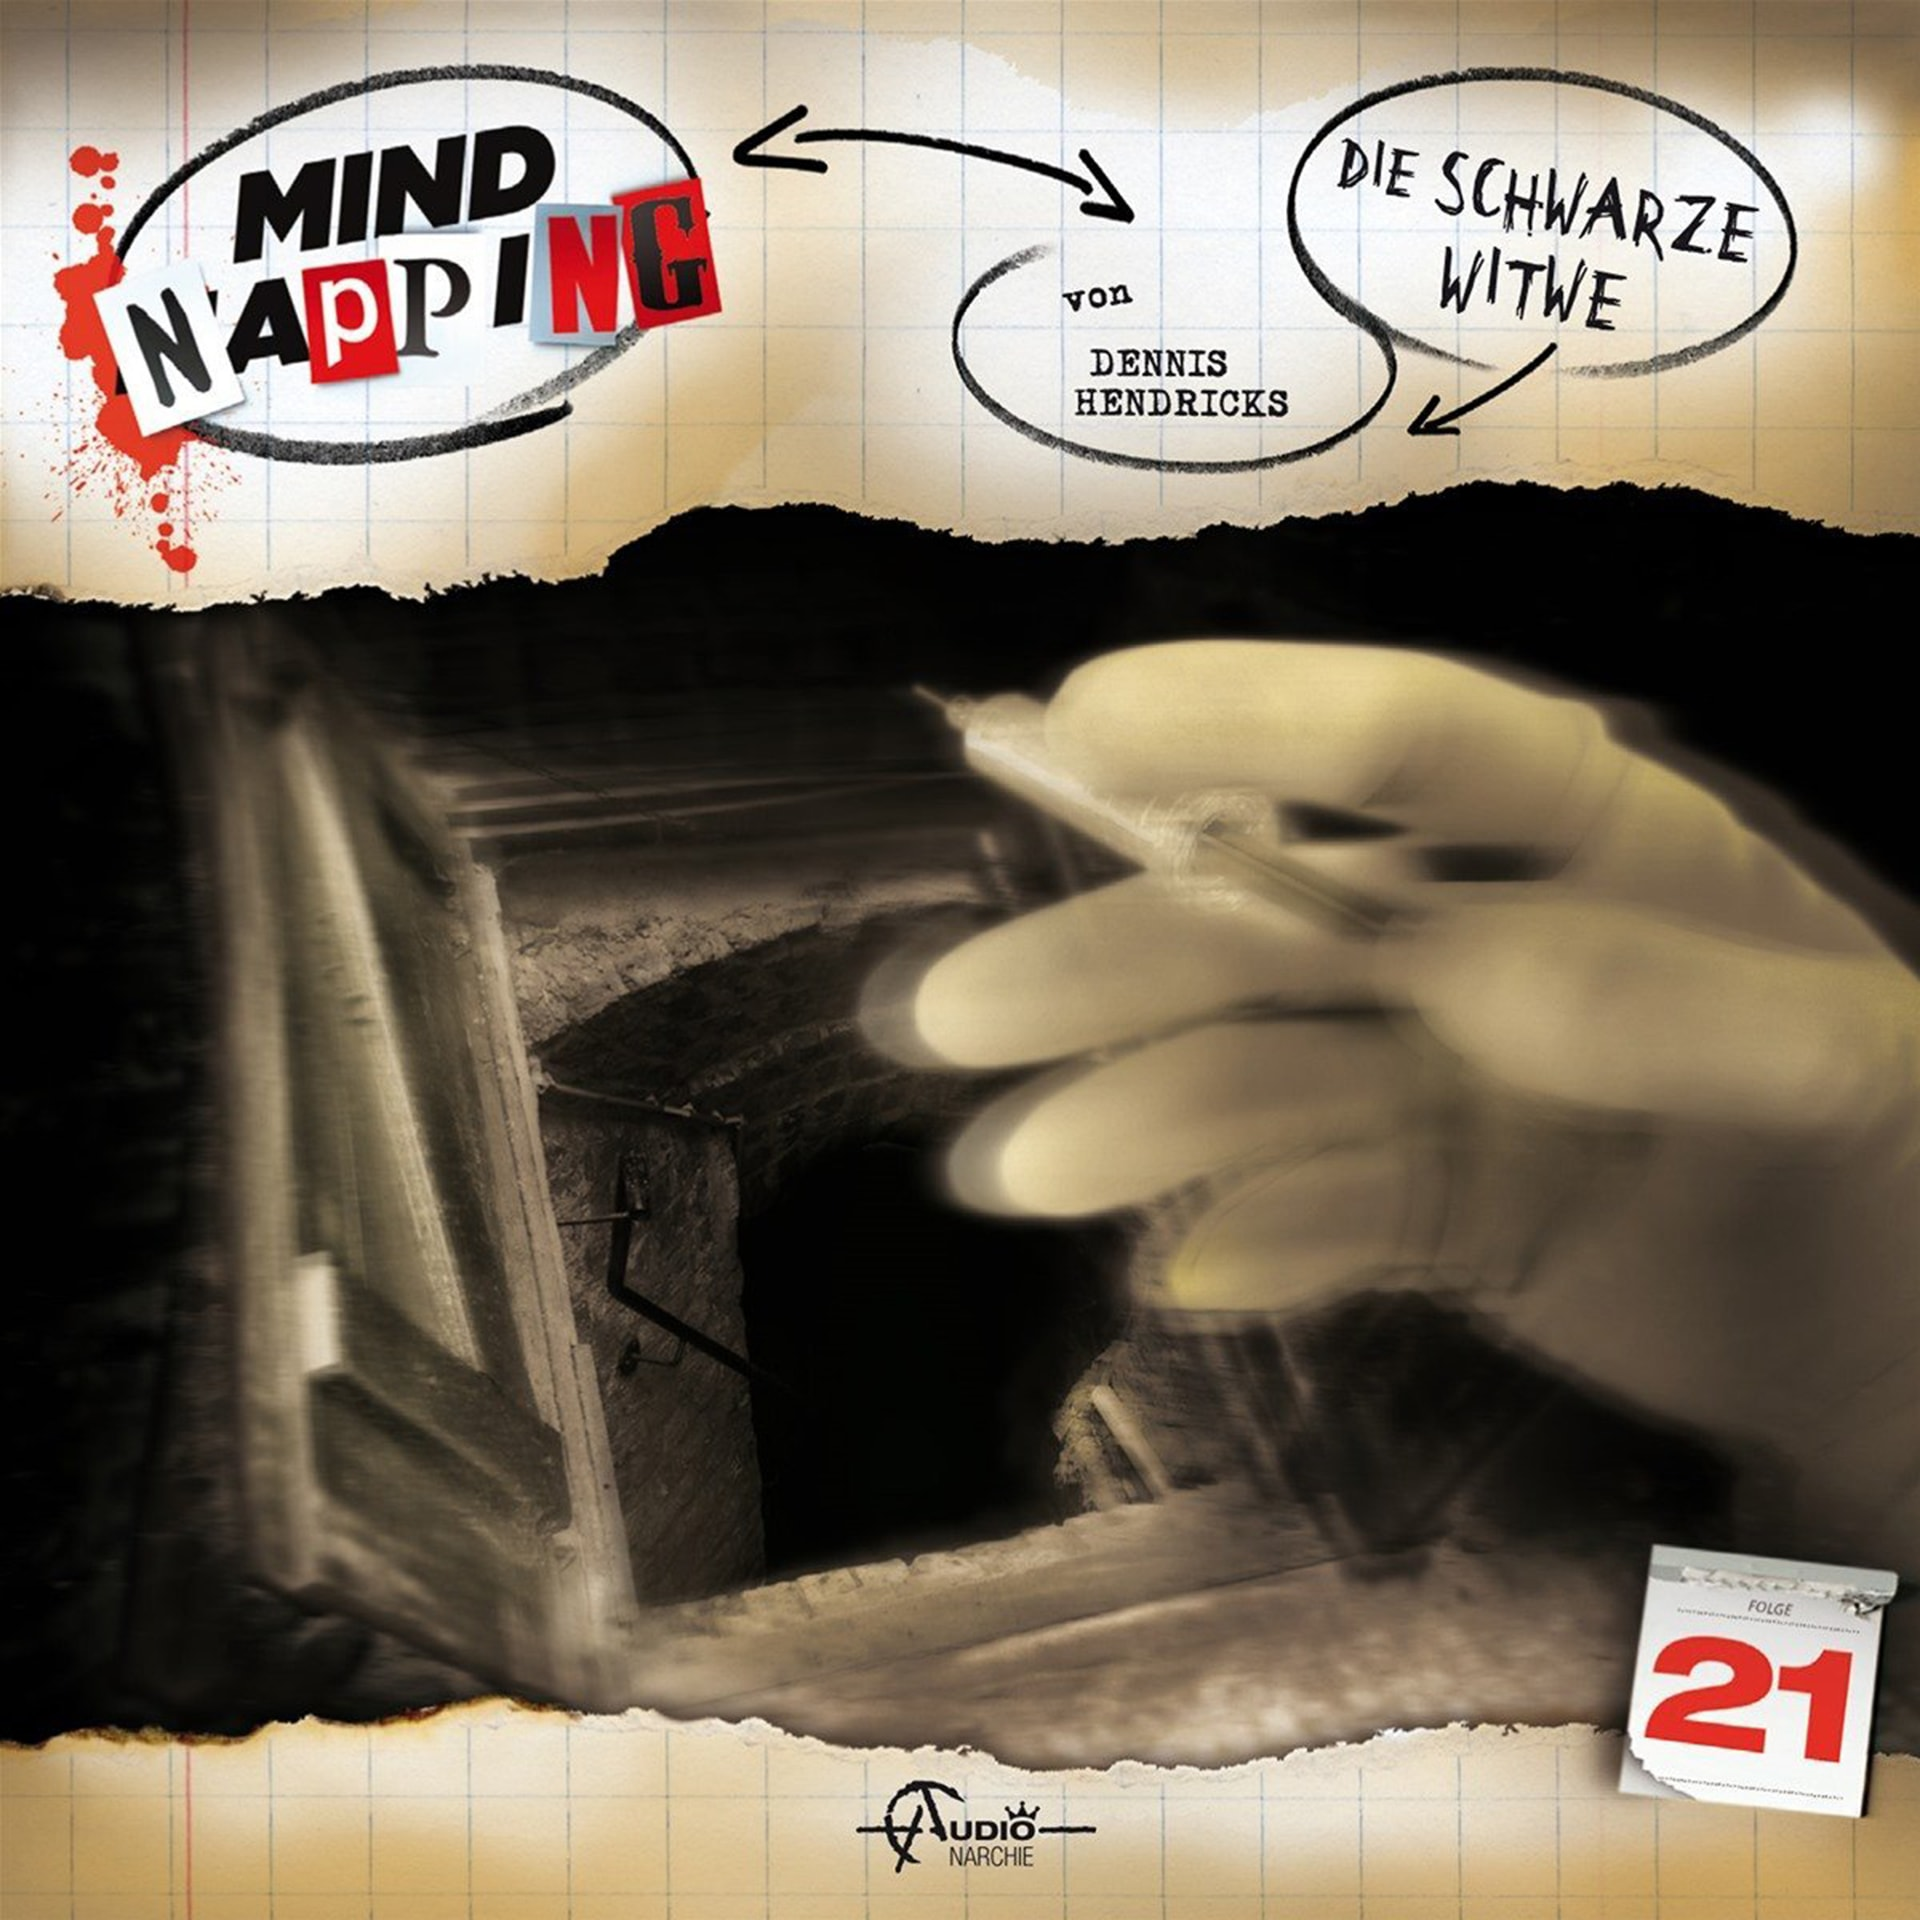 Mindnapping (21) – Die schwarze Witwe